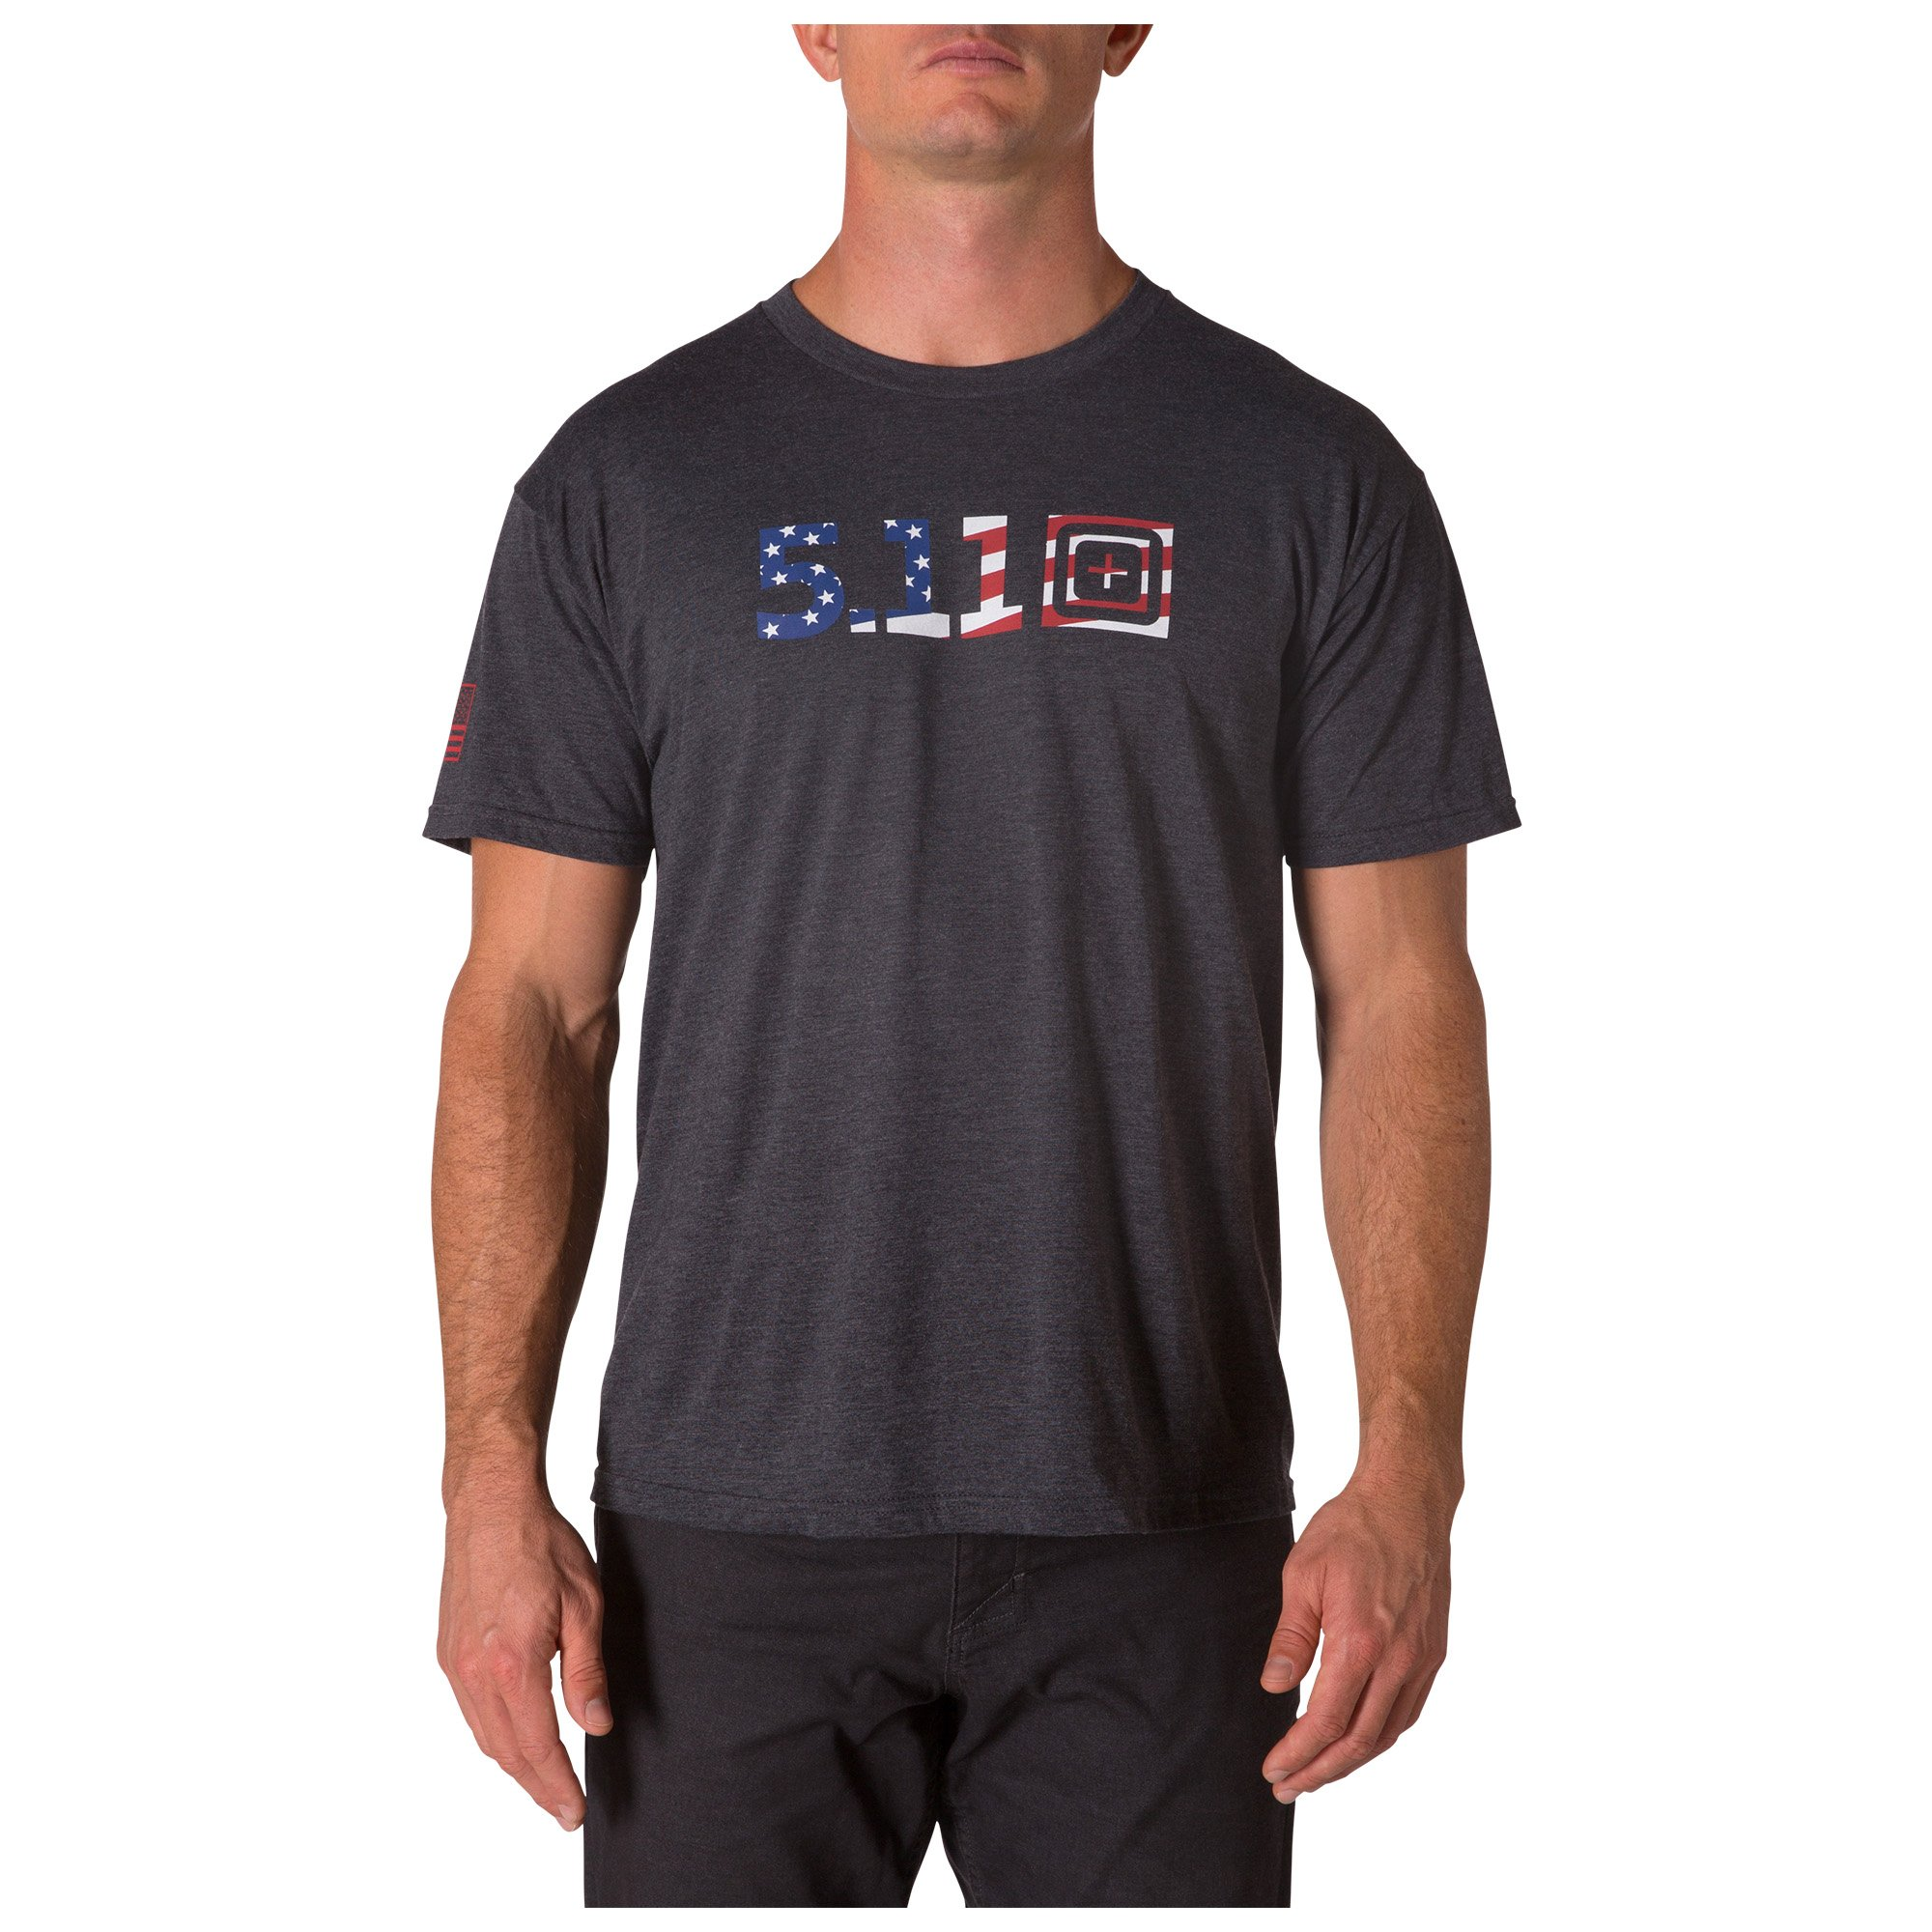 LEGACY USA FLAG FILL – CHARCOAL HEATHER